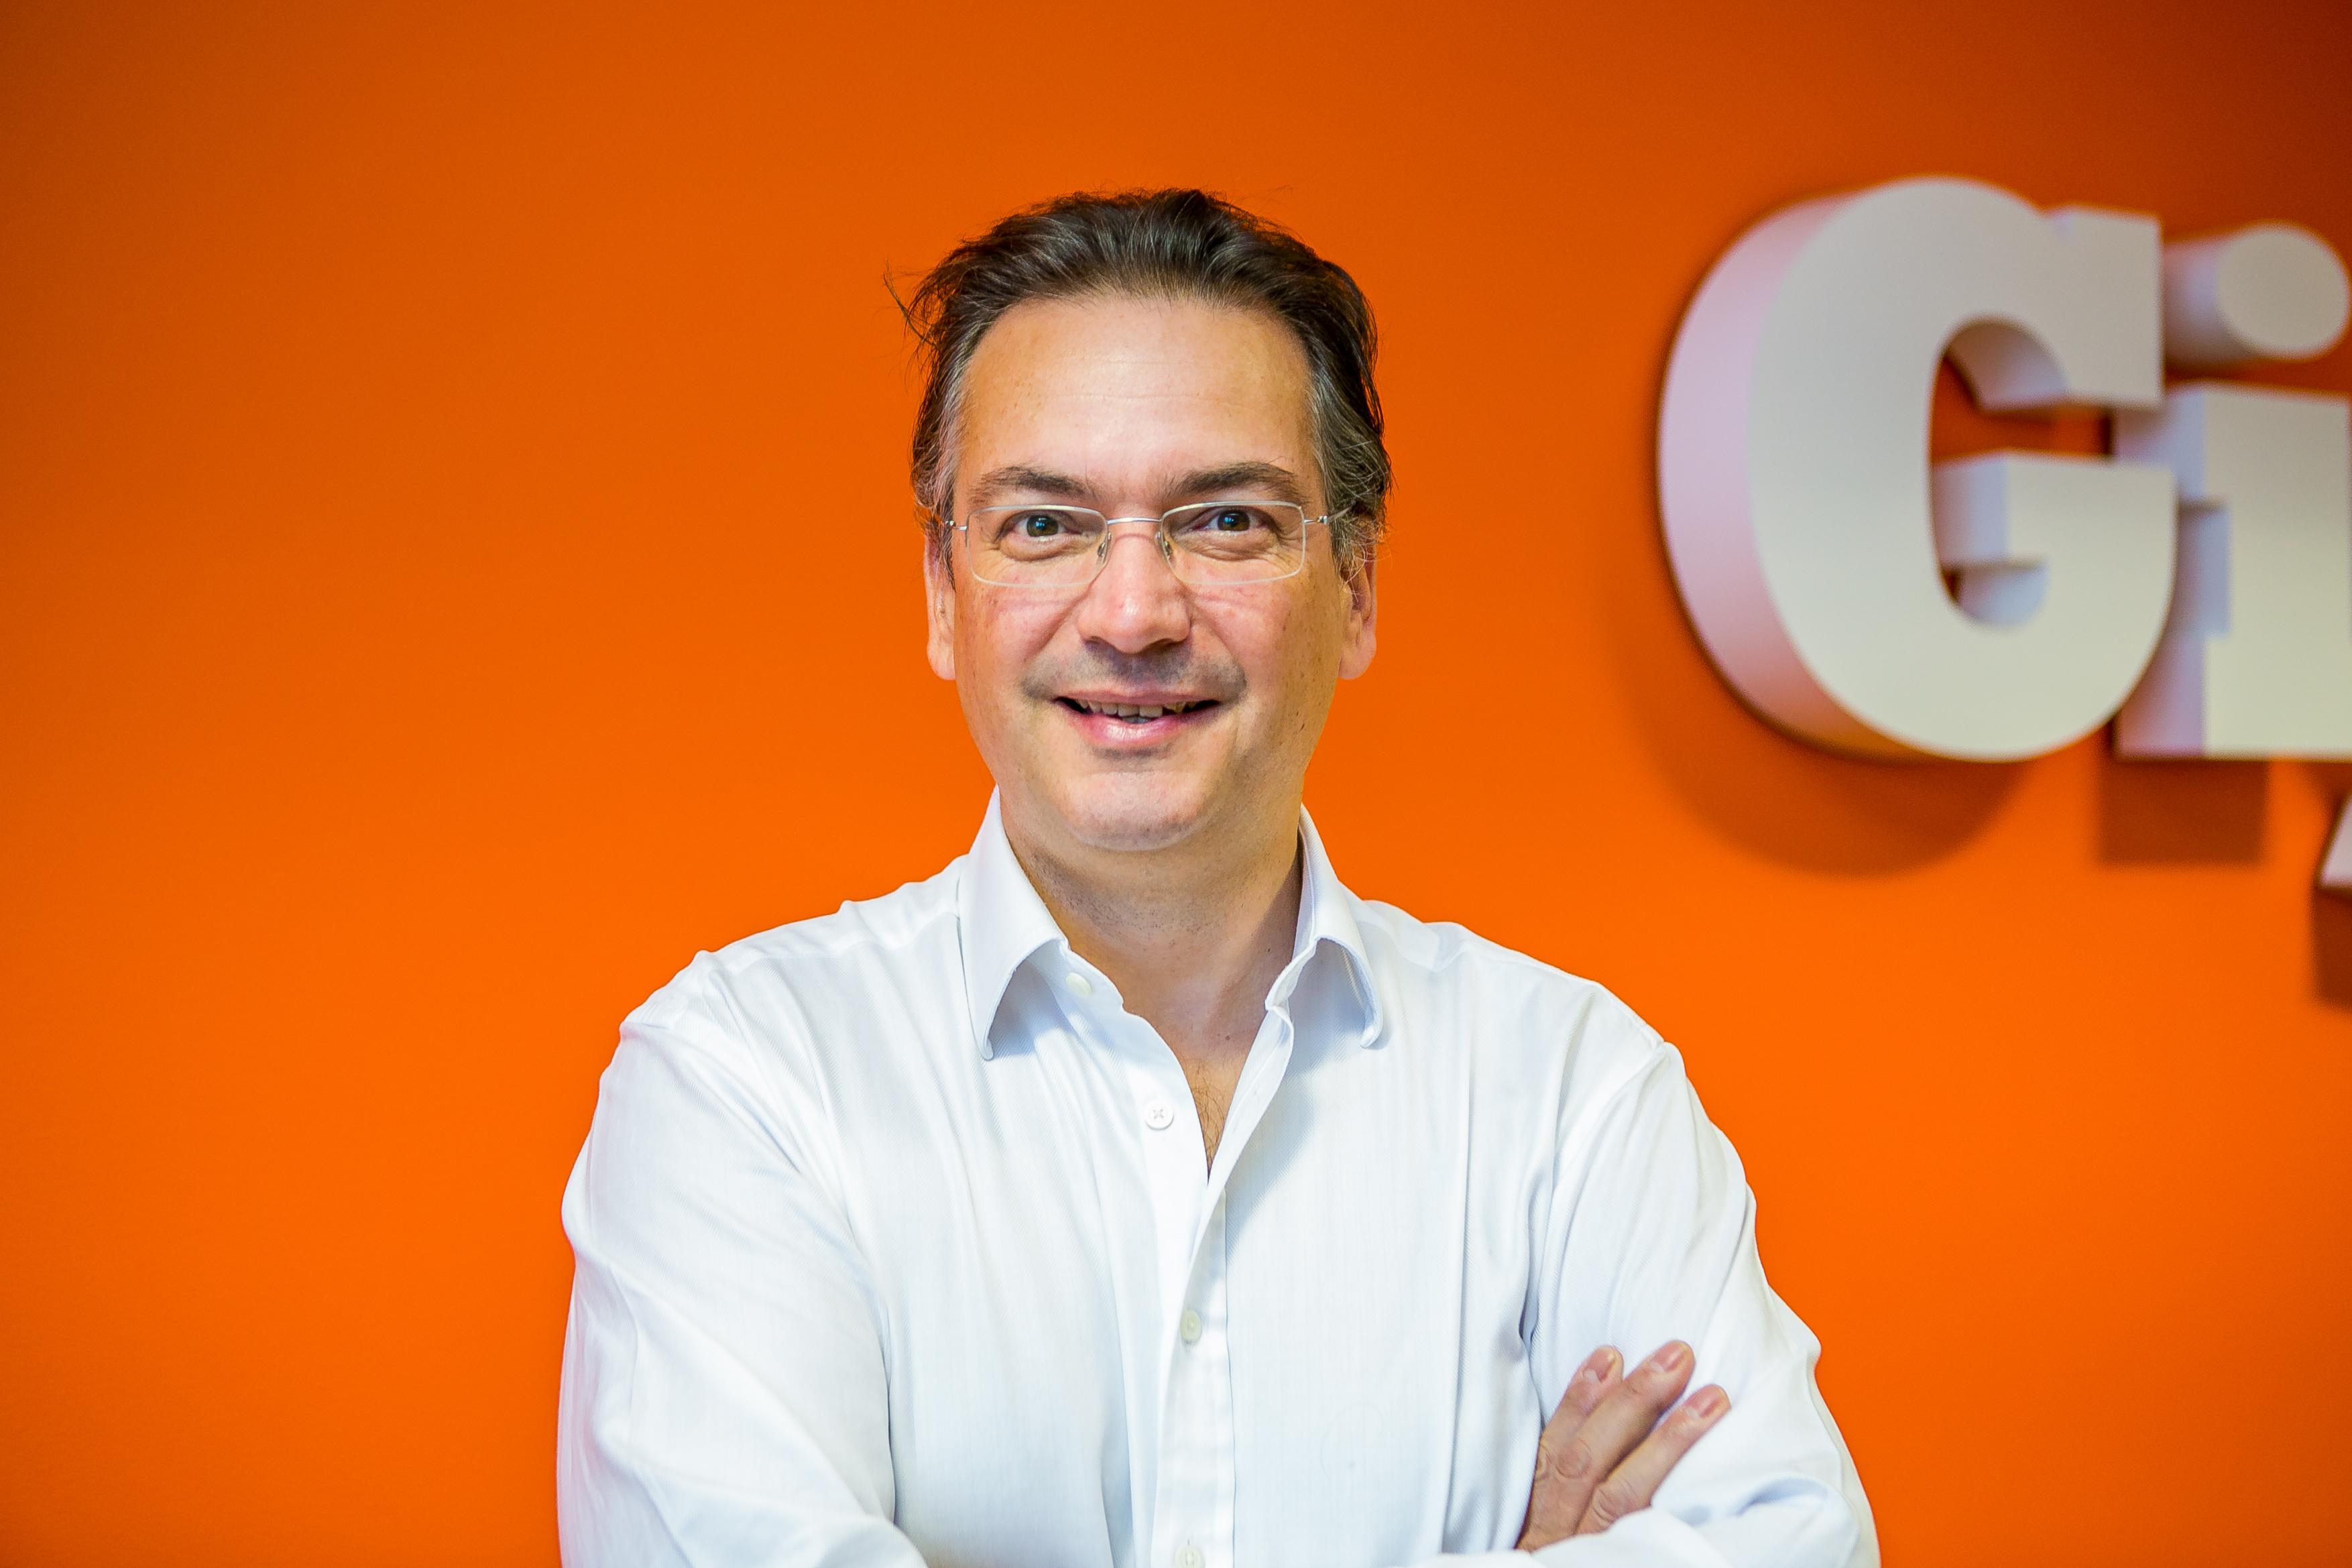 gigaclear CEO Matthew Hare